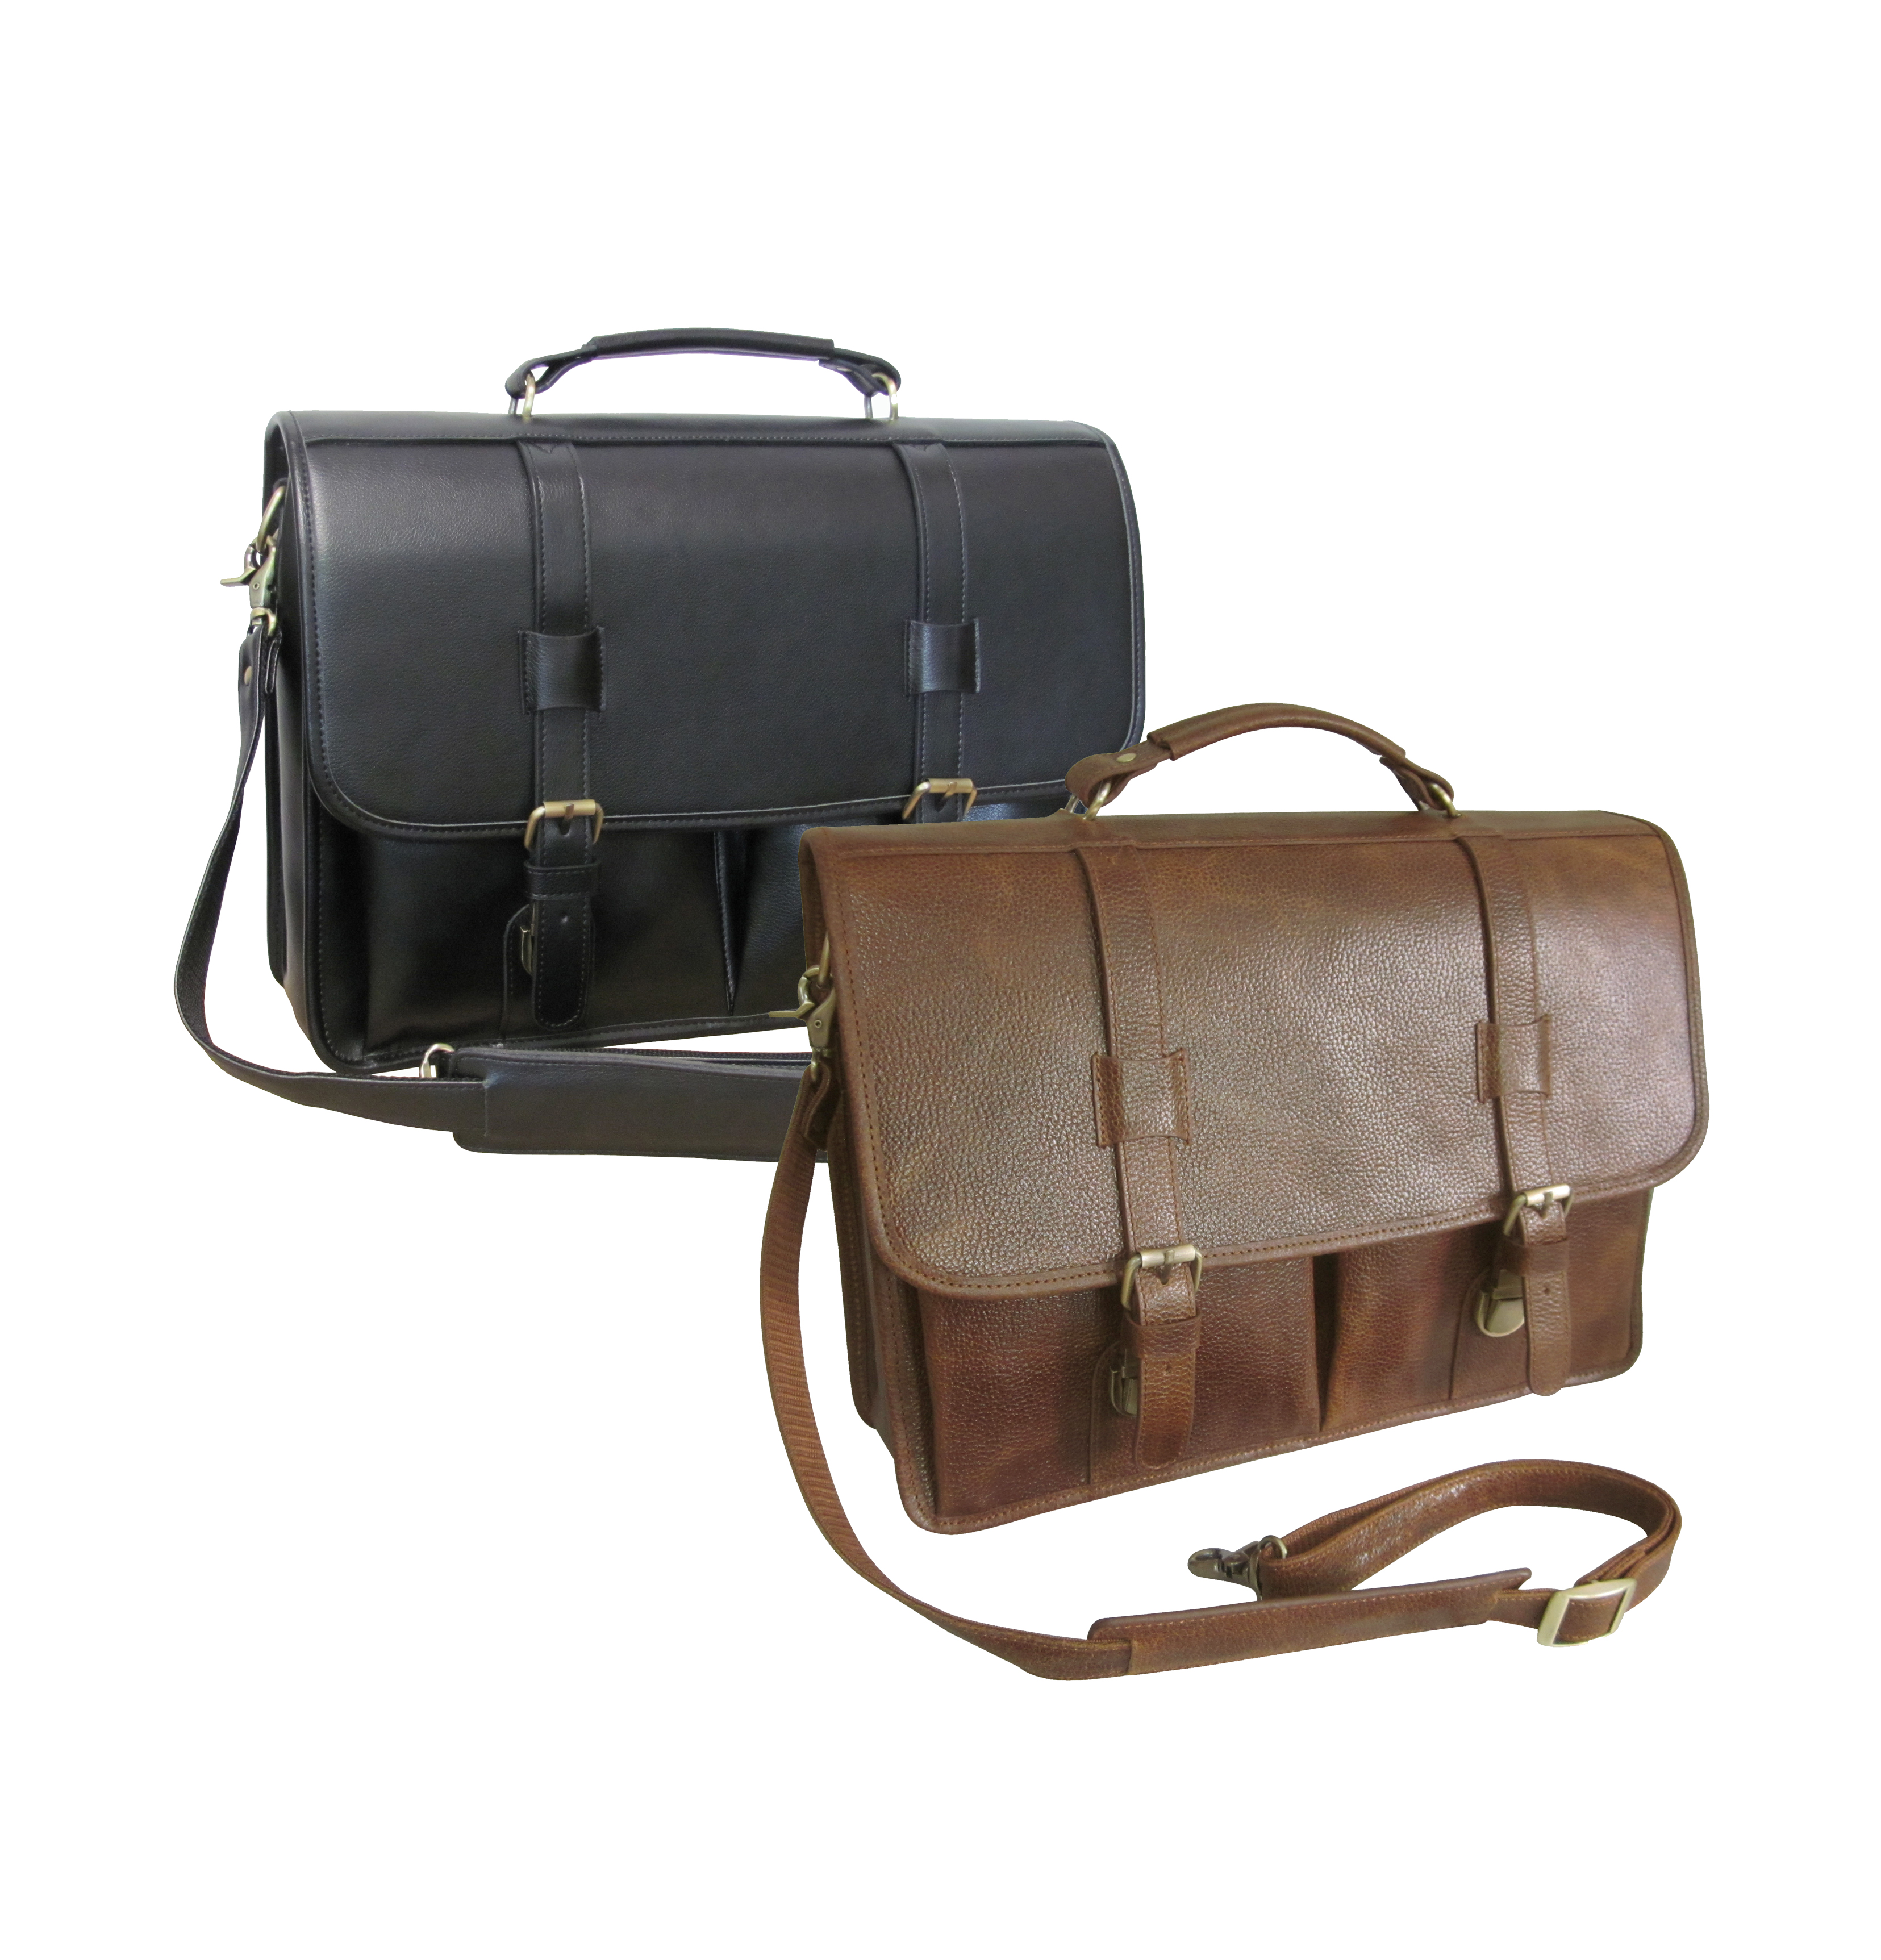 Amerileather 2510-2 Leather Executive Briefcase - Brown